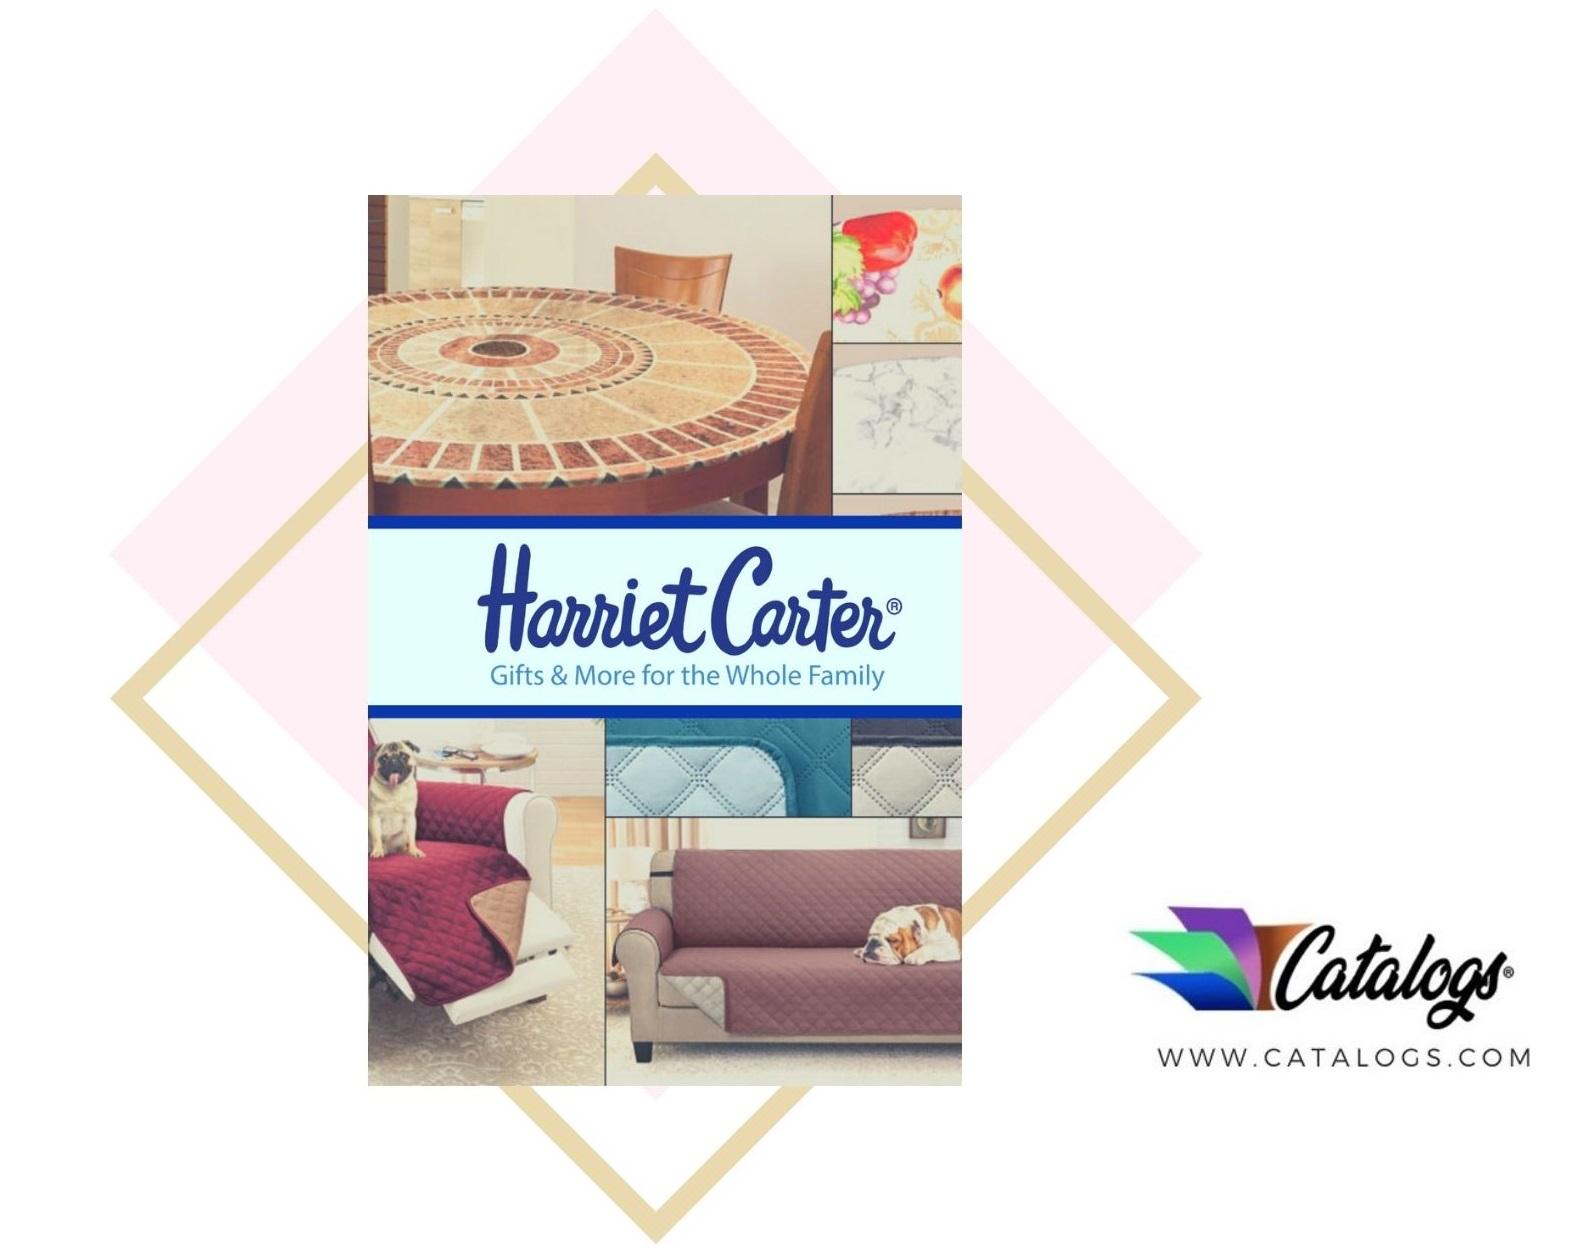 How Do I Order a Free Harriet Carter Catalog?